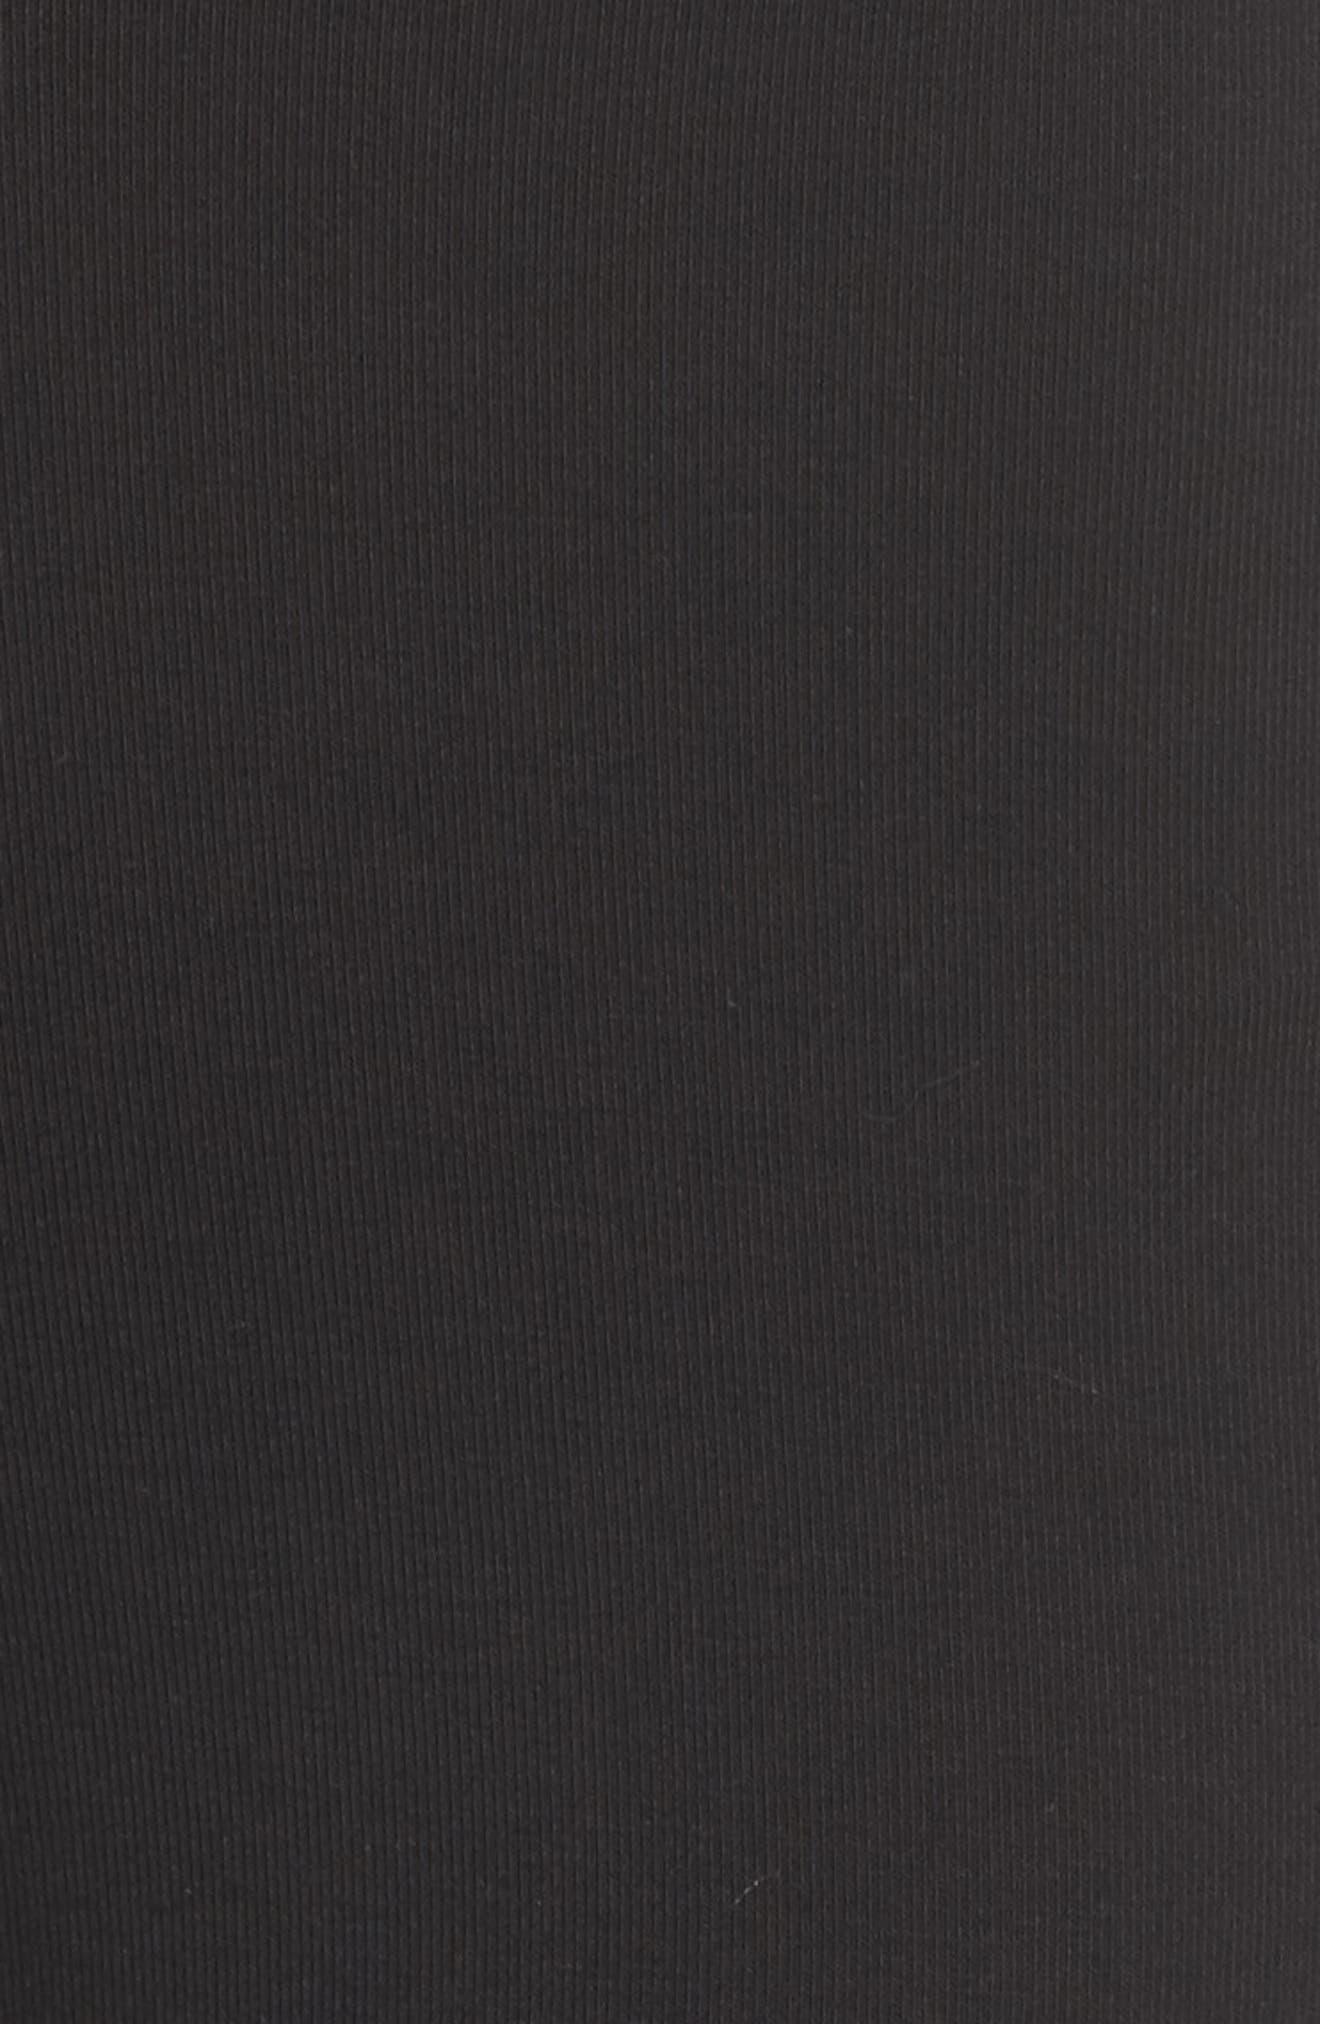 Sportswear Women's Leggings,                             Alternate thumbnail 6, color,                             Black/ Sail